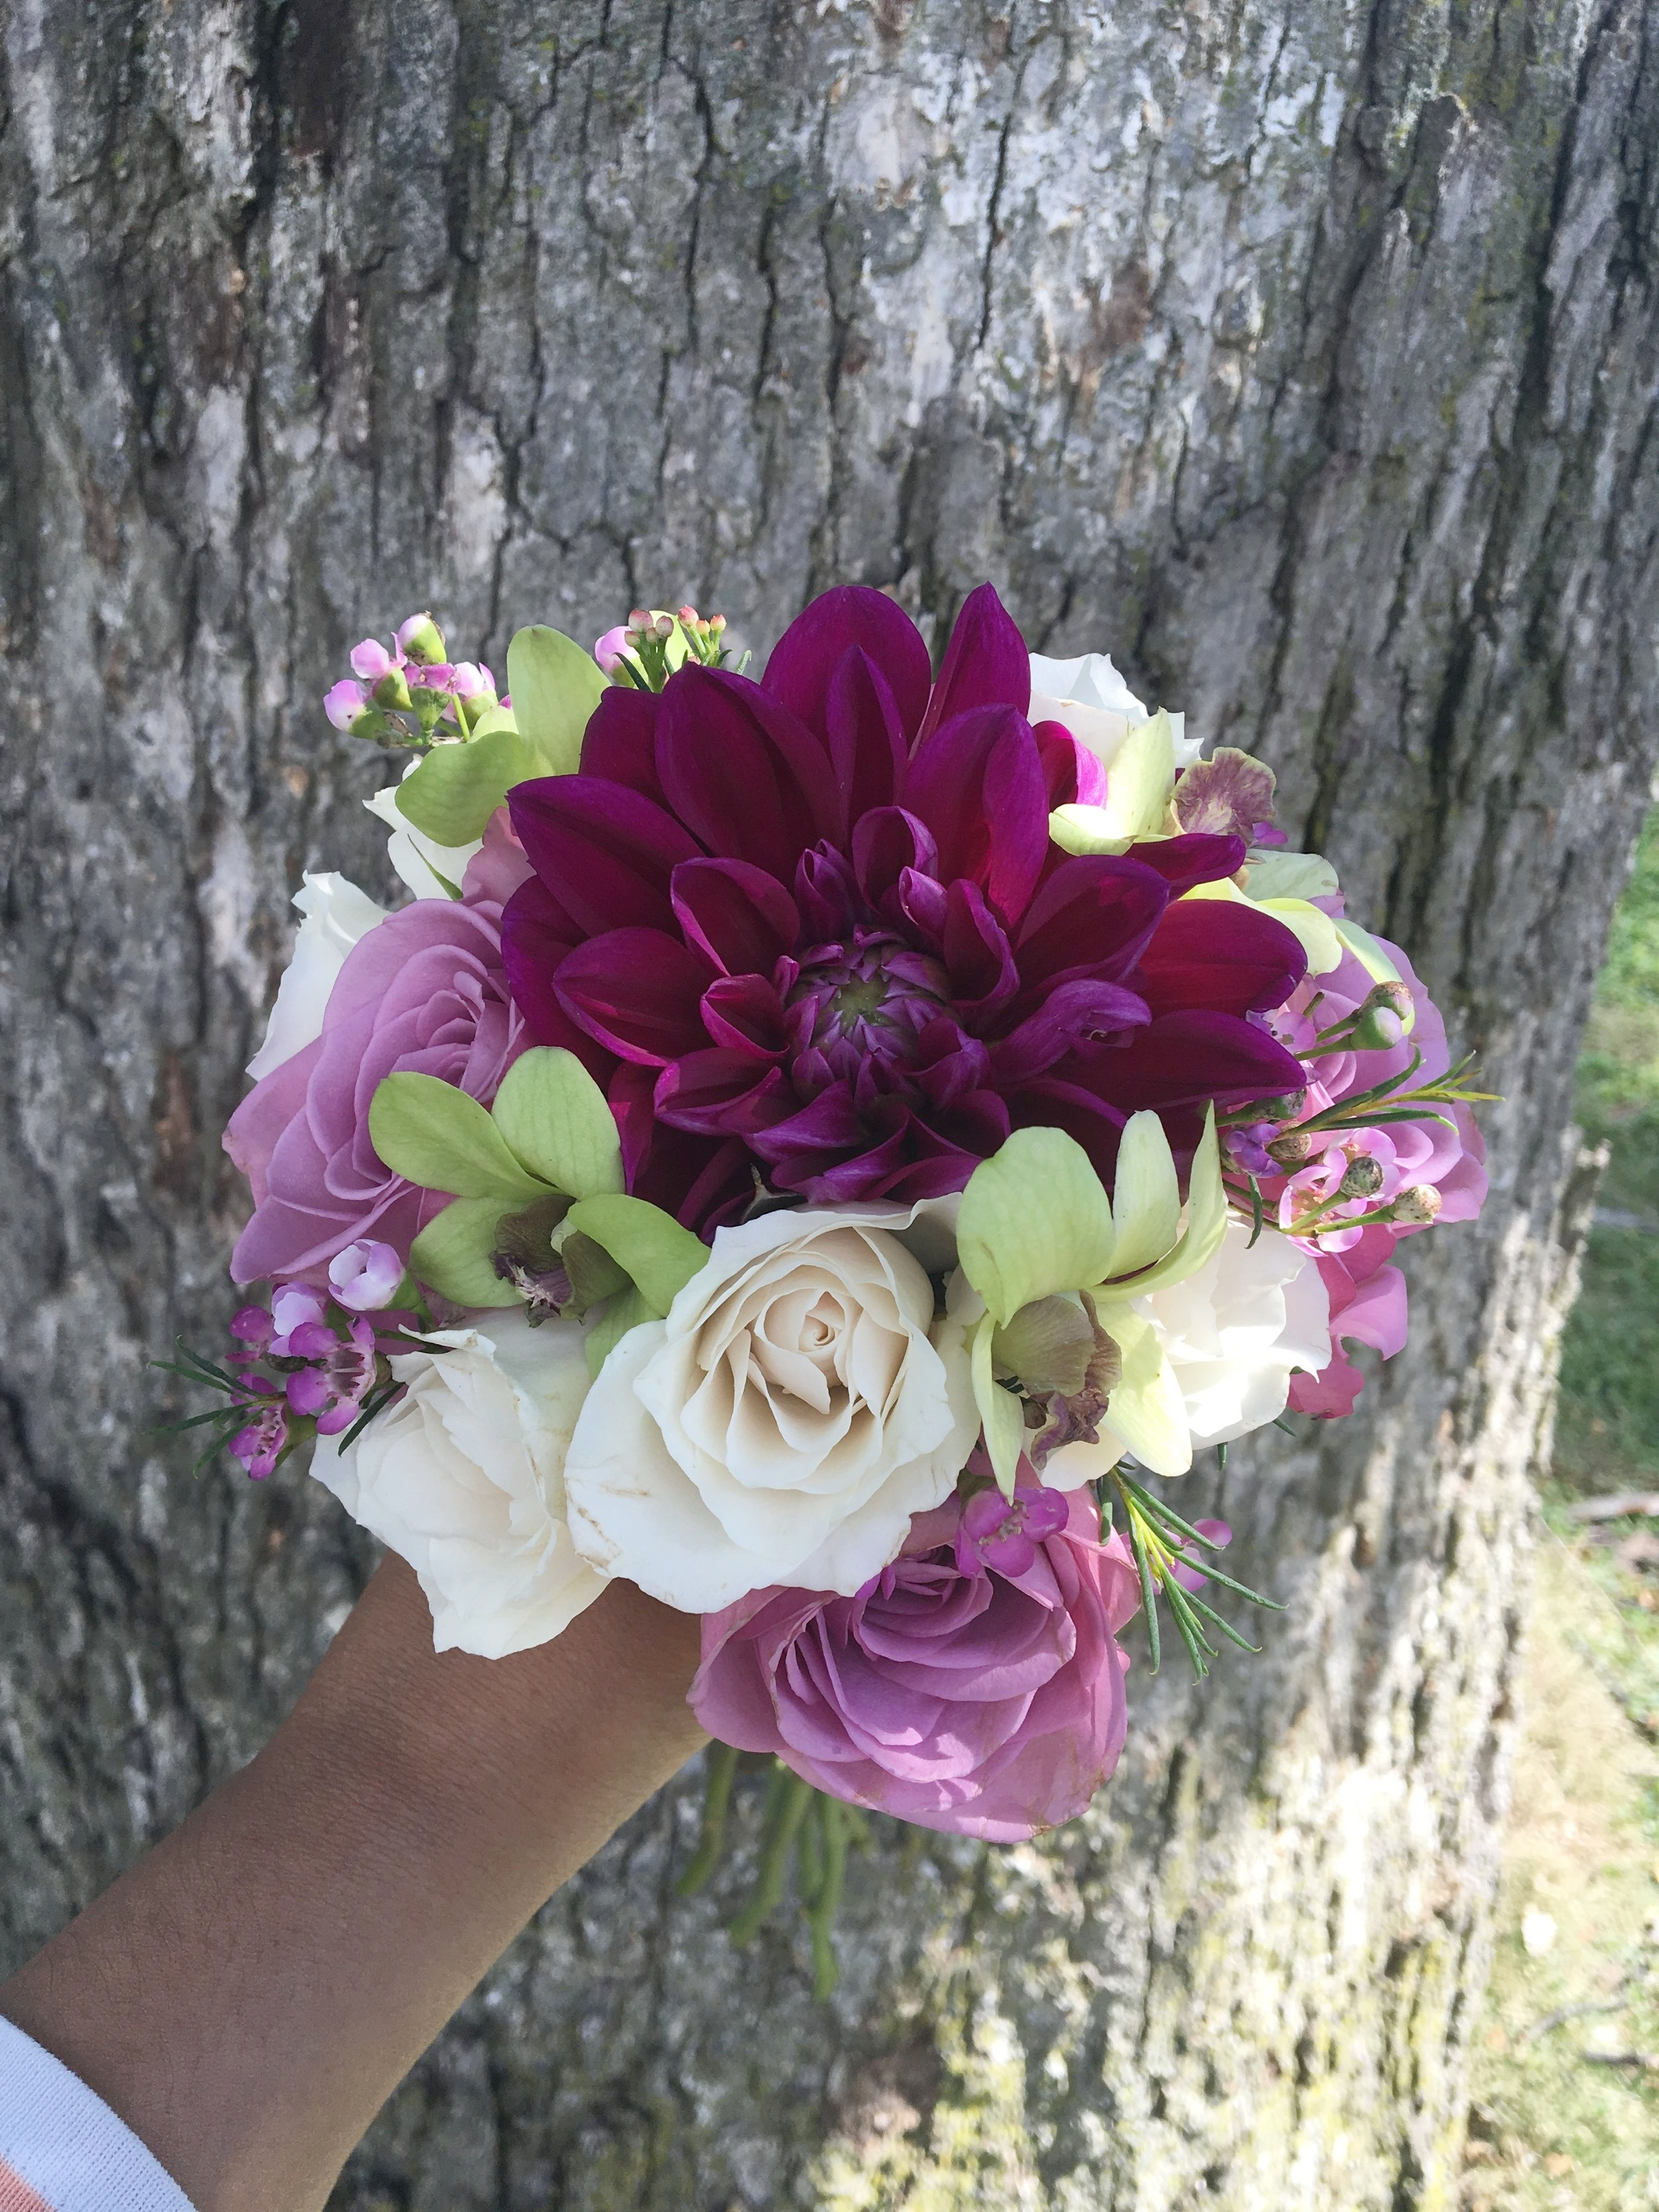 Evelisa Floral & Design: Bouquet